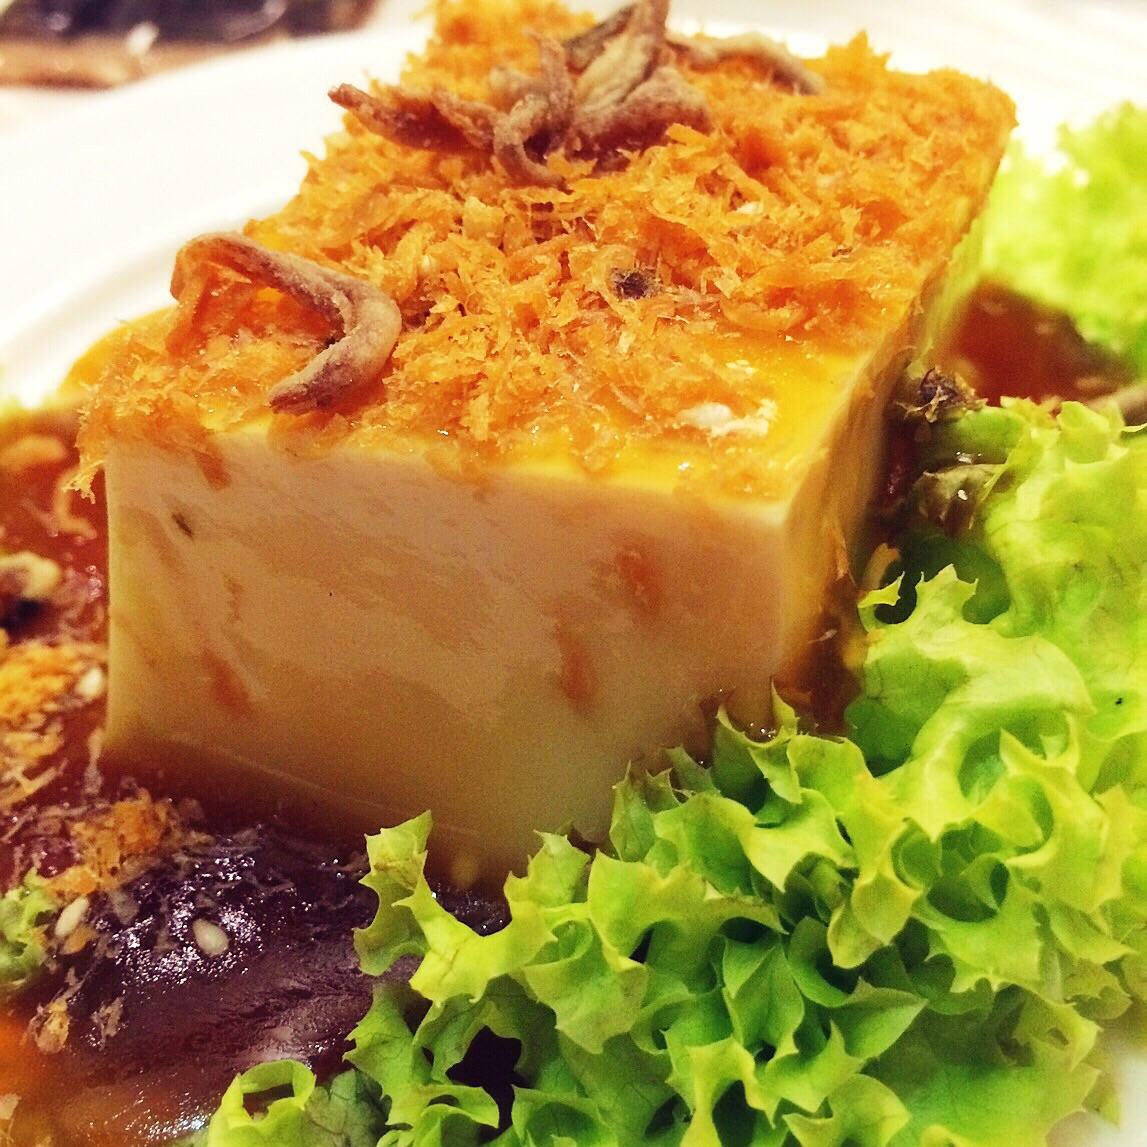 Cold Toufuwith Mushroom Sauce and Crispy Floss